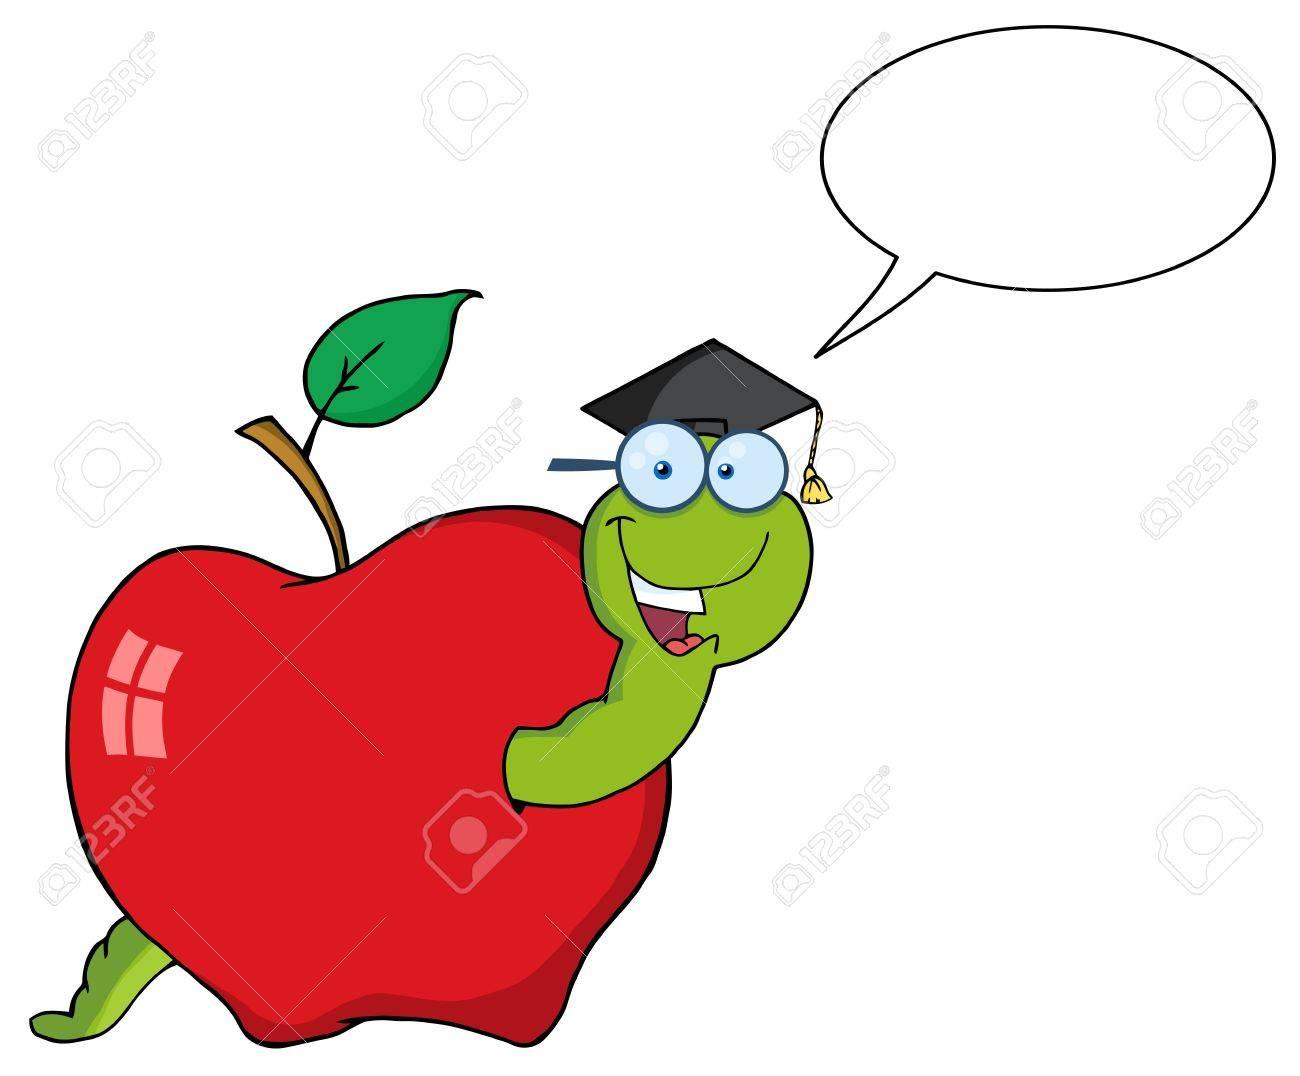 Happy Graduate Worm In Apple With Speech Bubble Stock Vector - 9634045